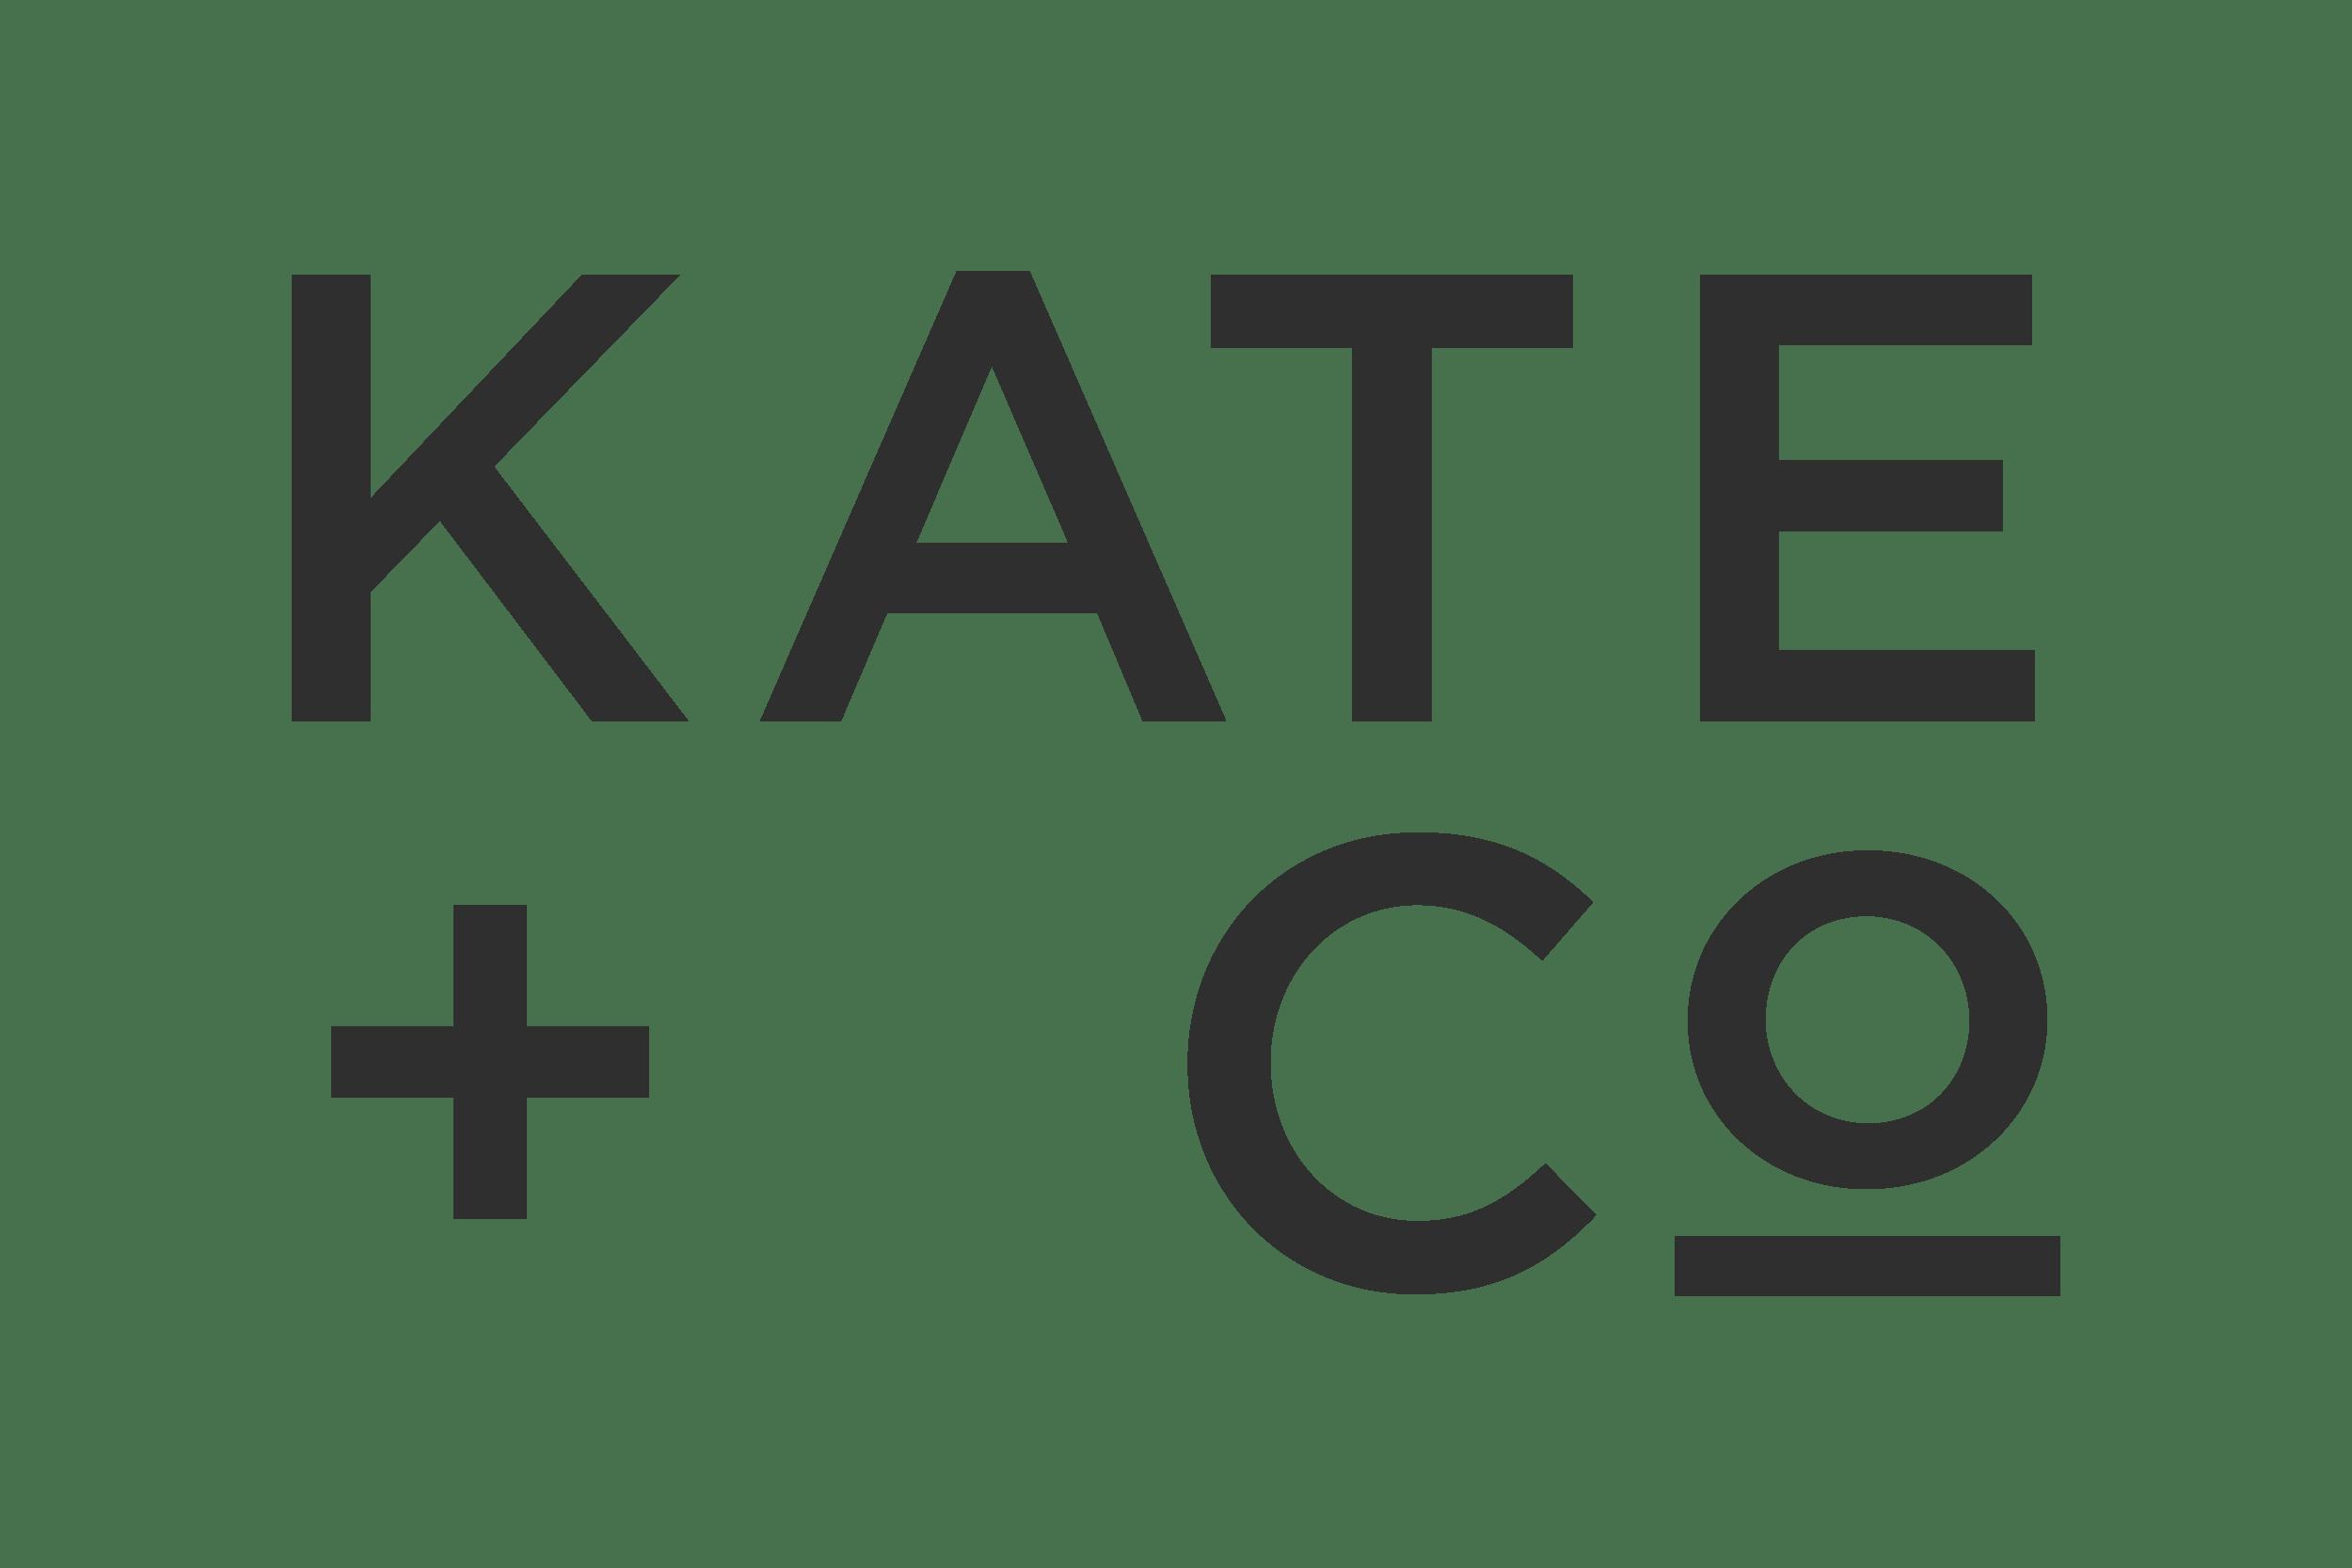 Kate + Co